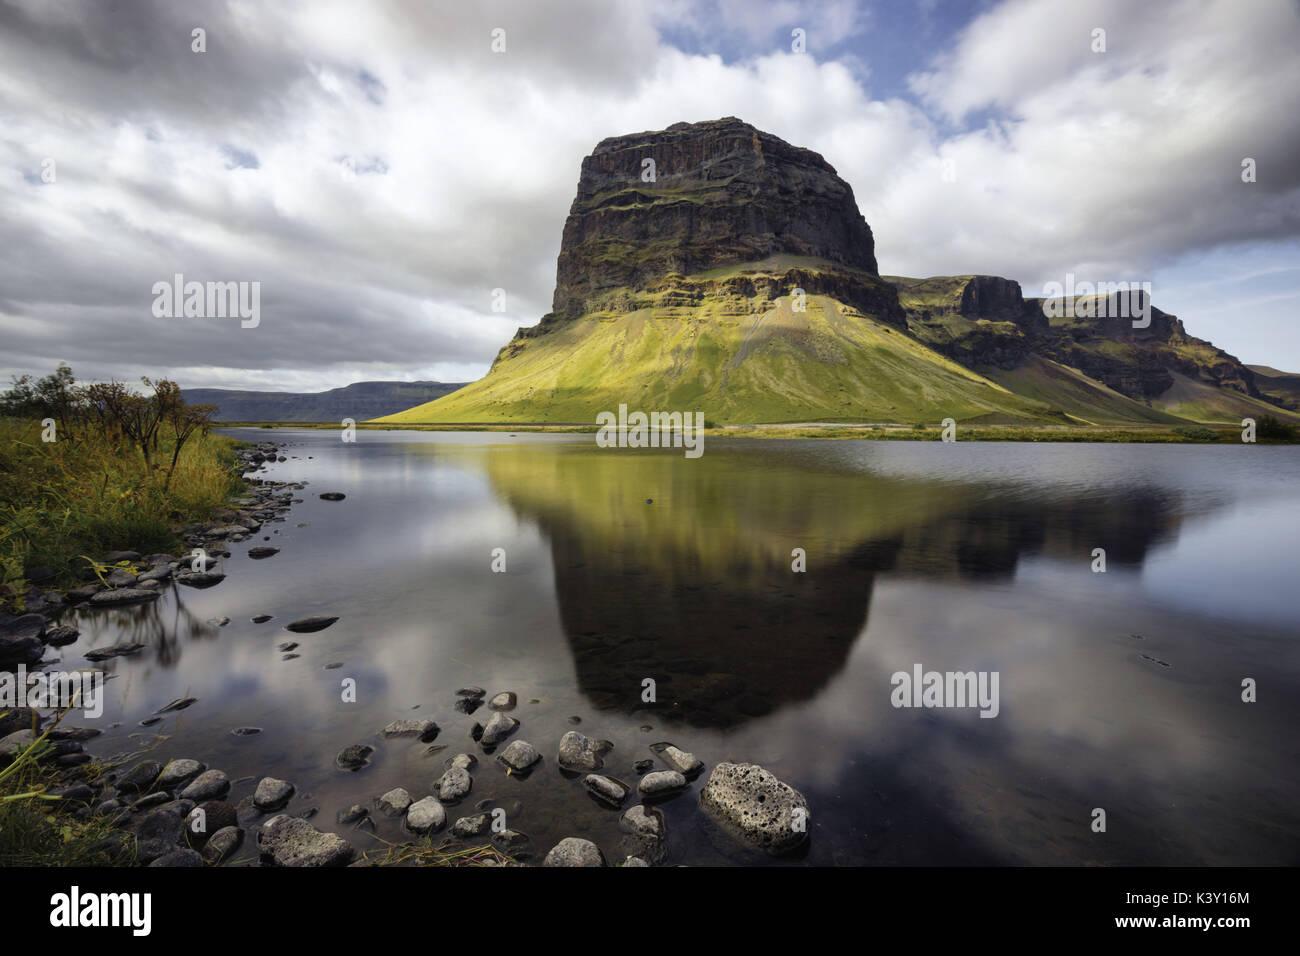 Mountain reflète dans un lac d'Islande. Photo Stock